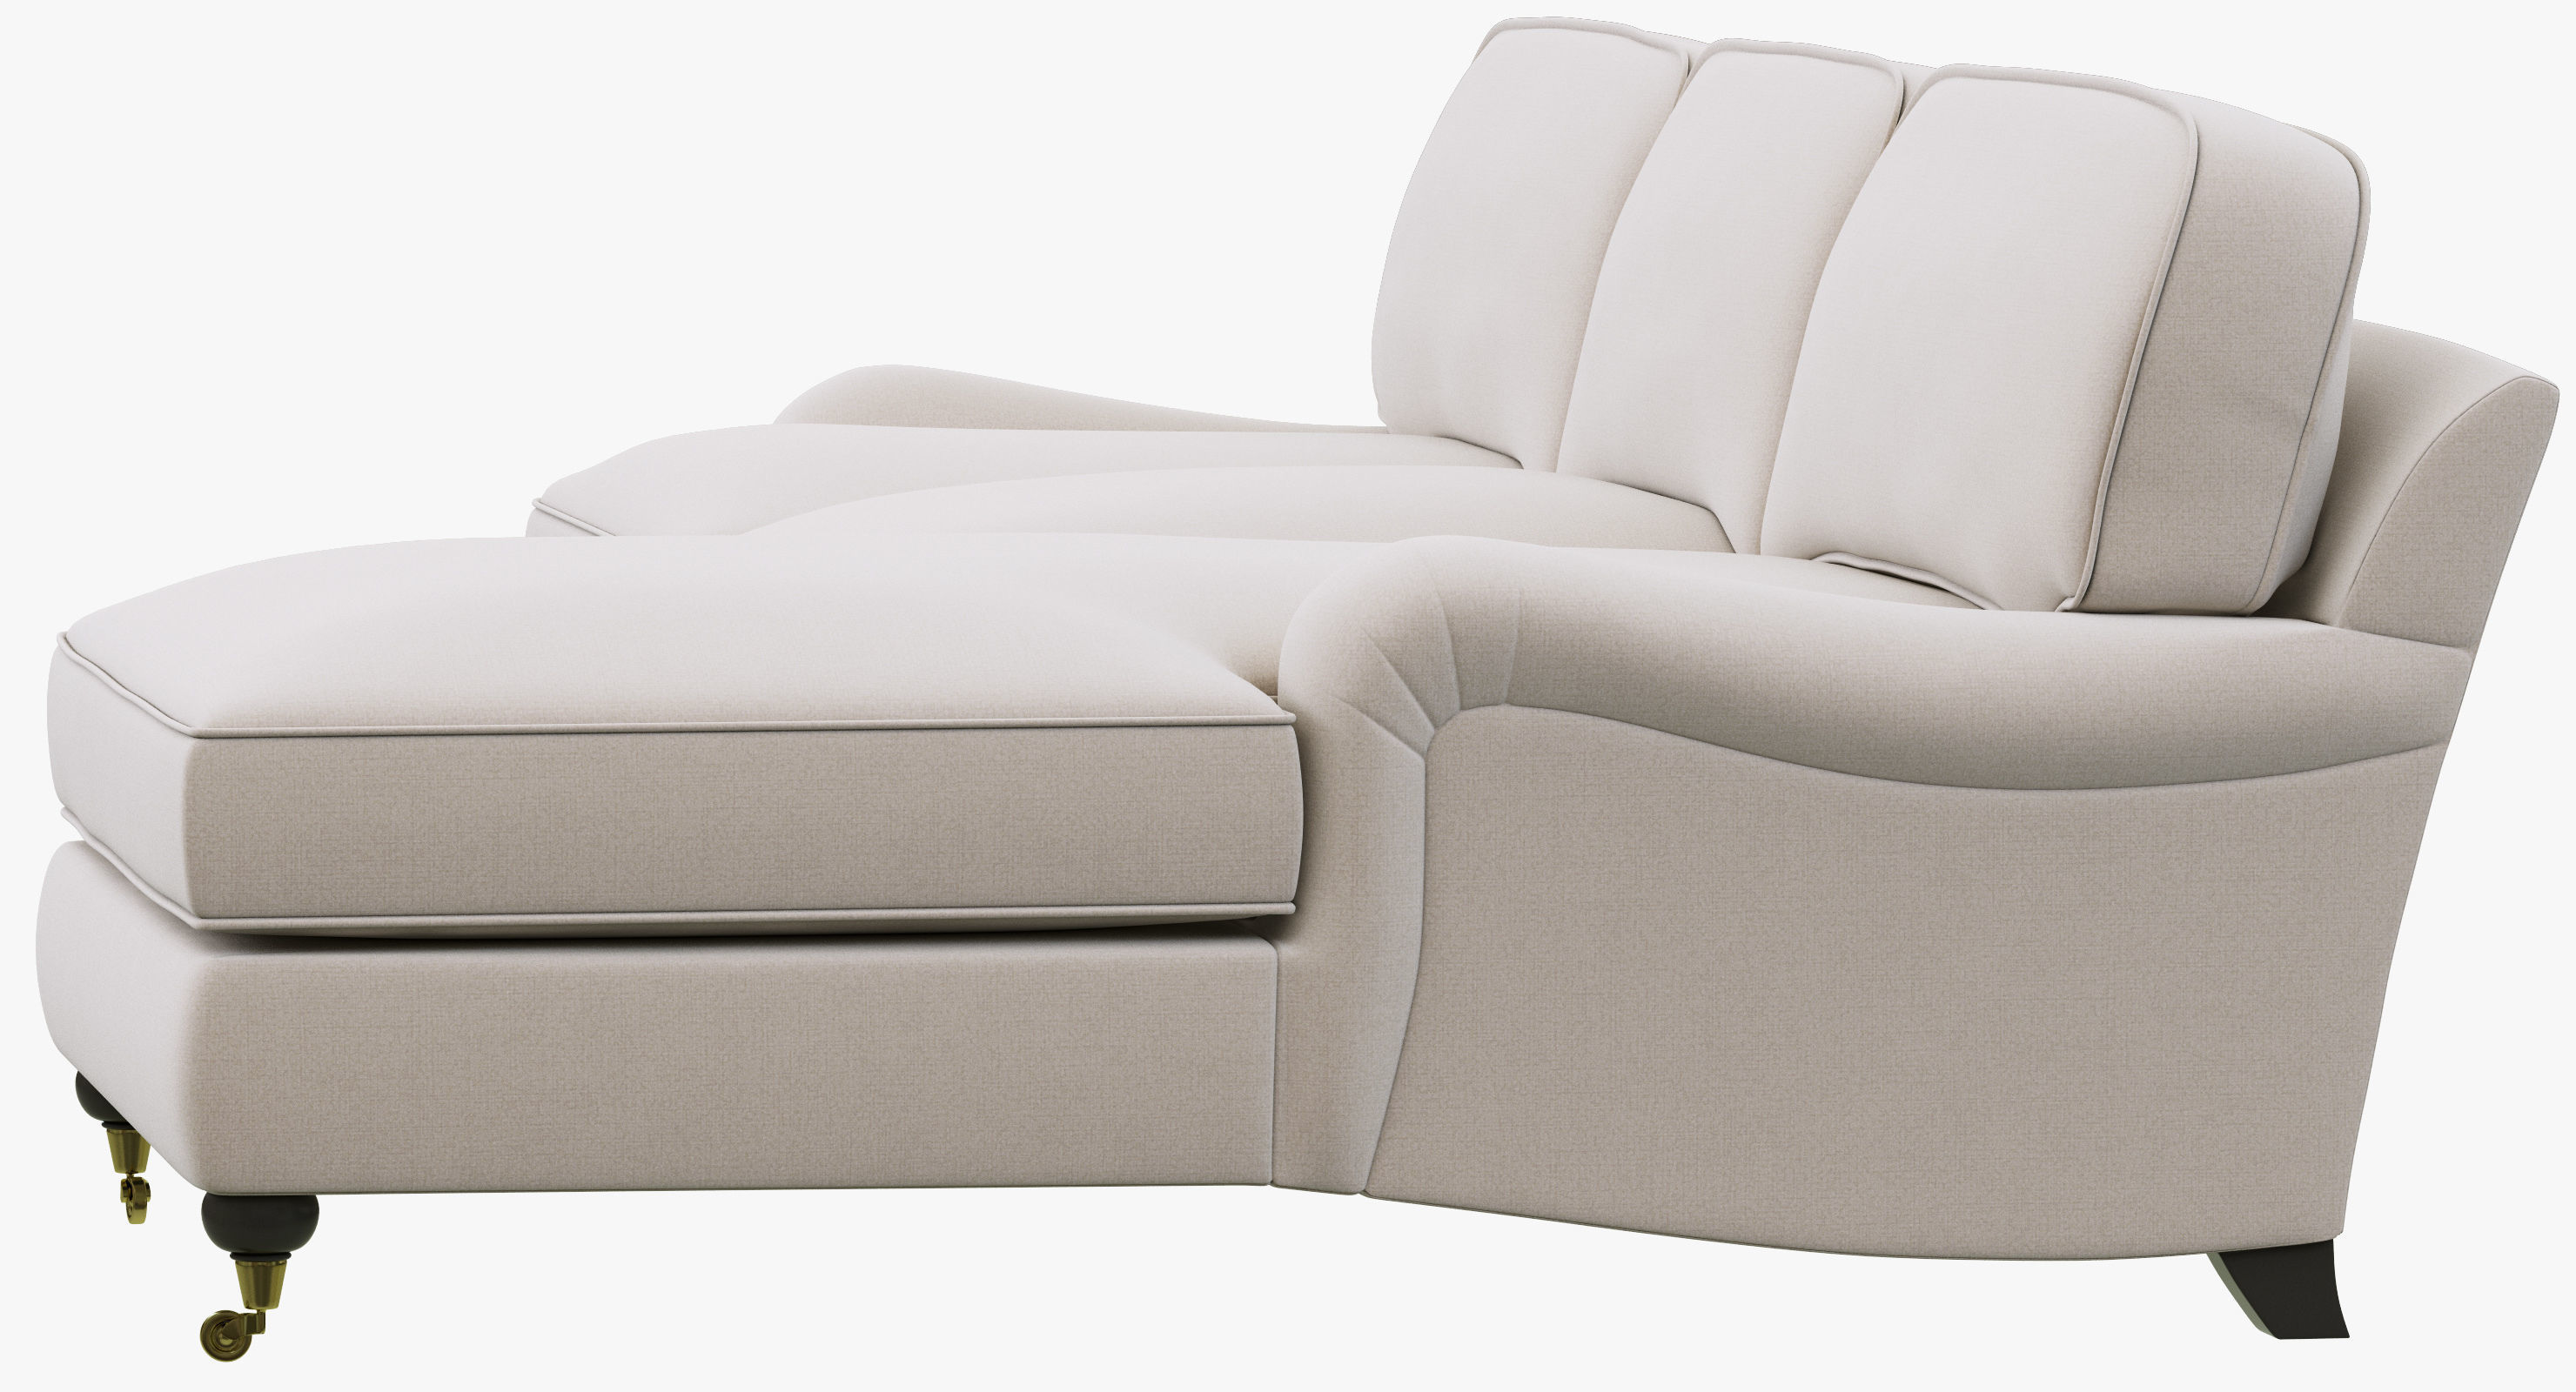 english arm sofa restoration hardware tufted living room decor roll upholstered right